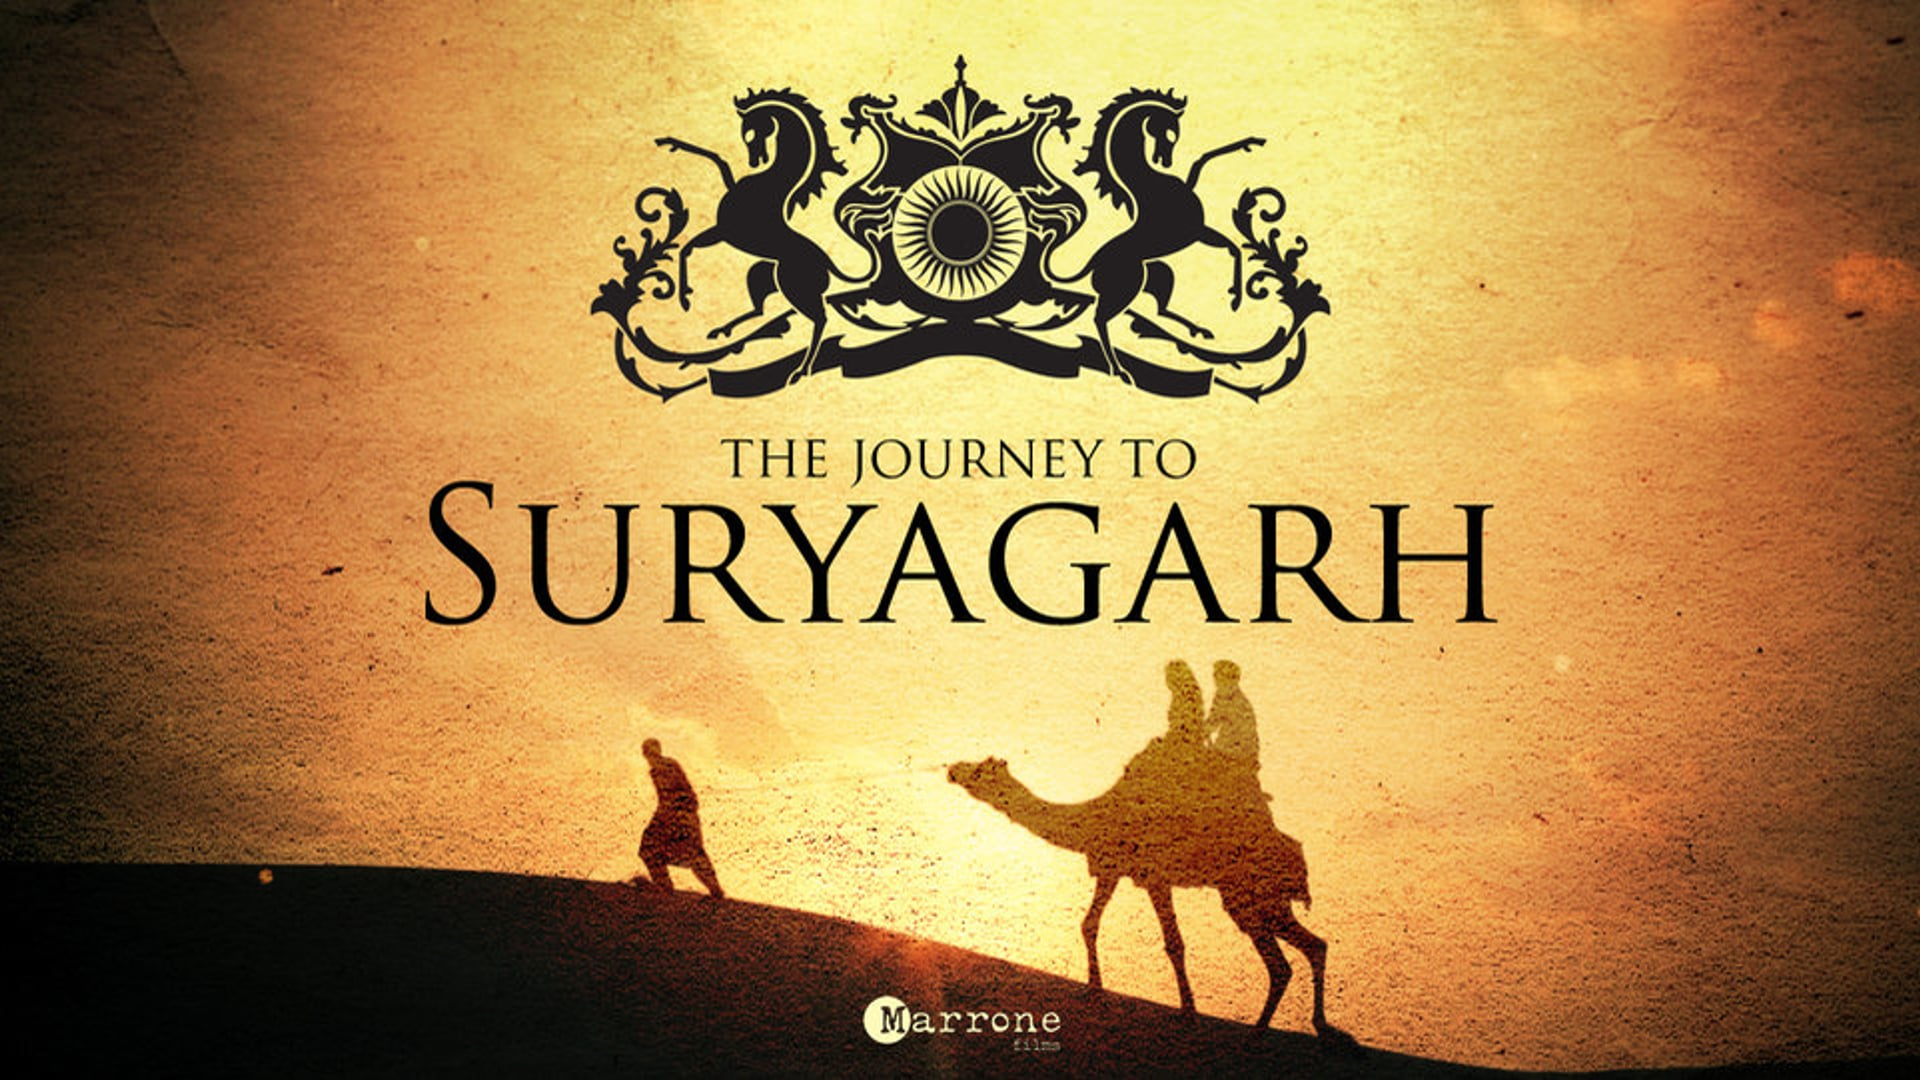 The Journey to Suryagarh